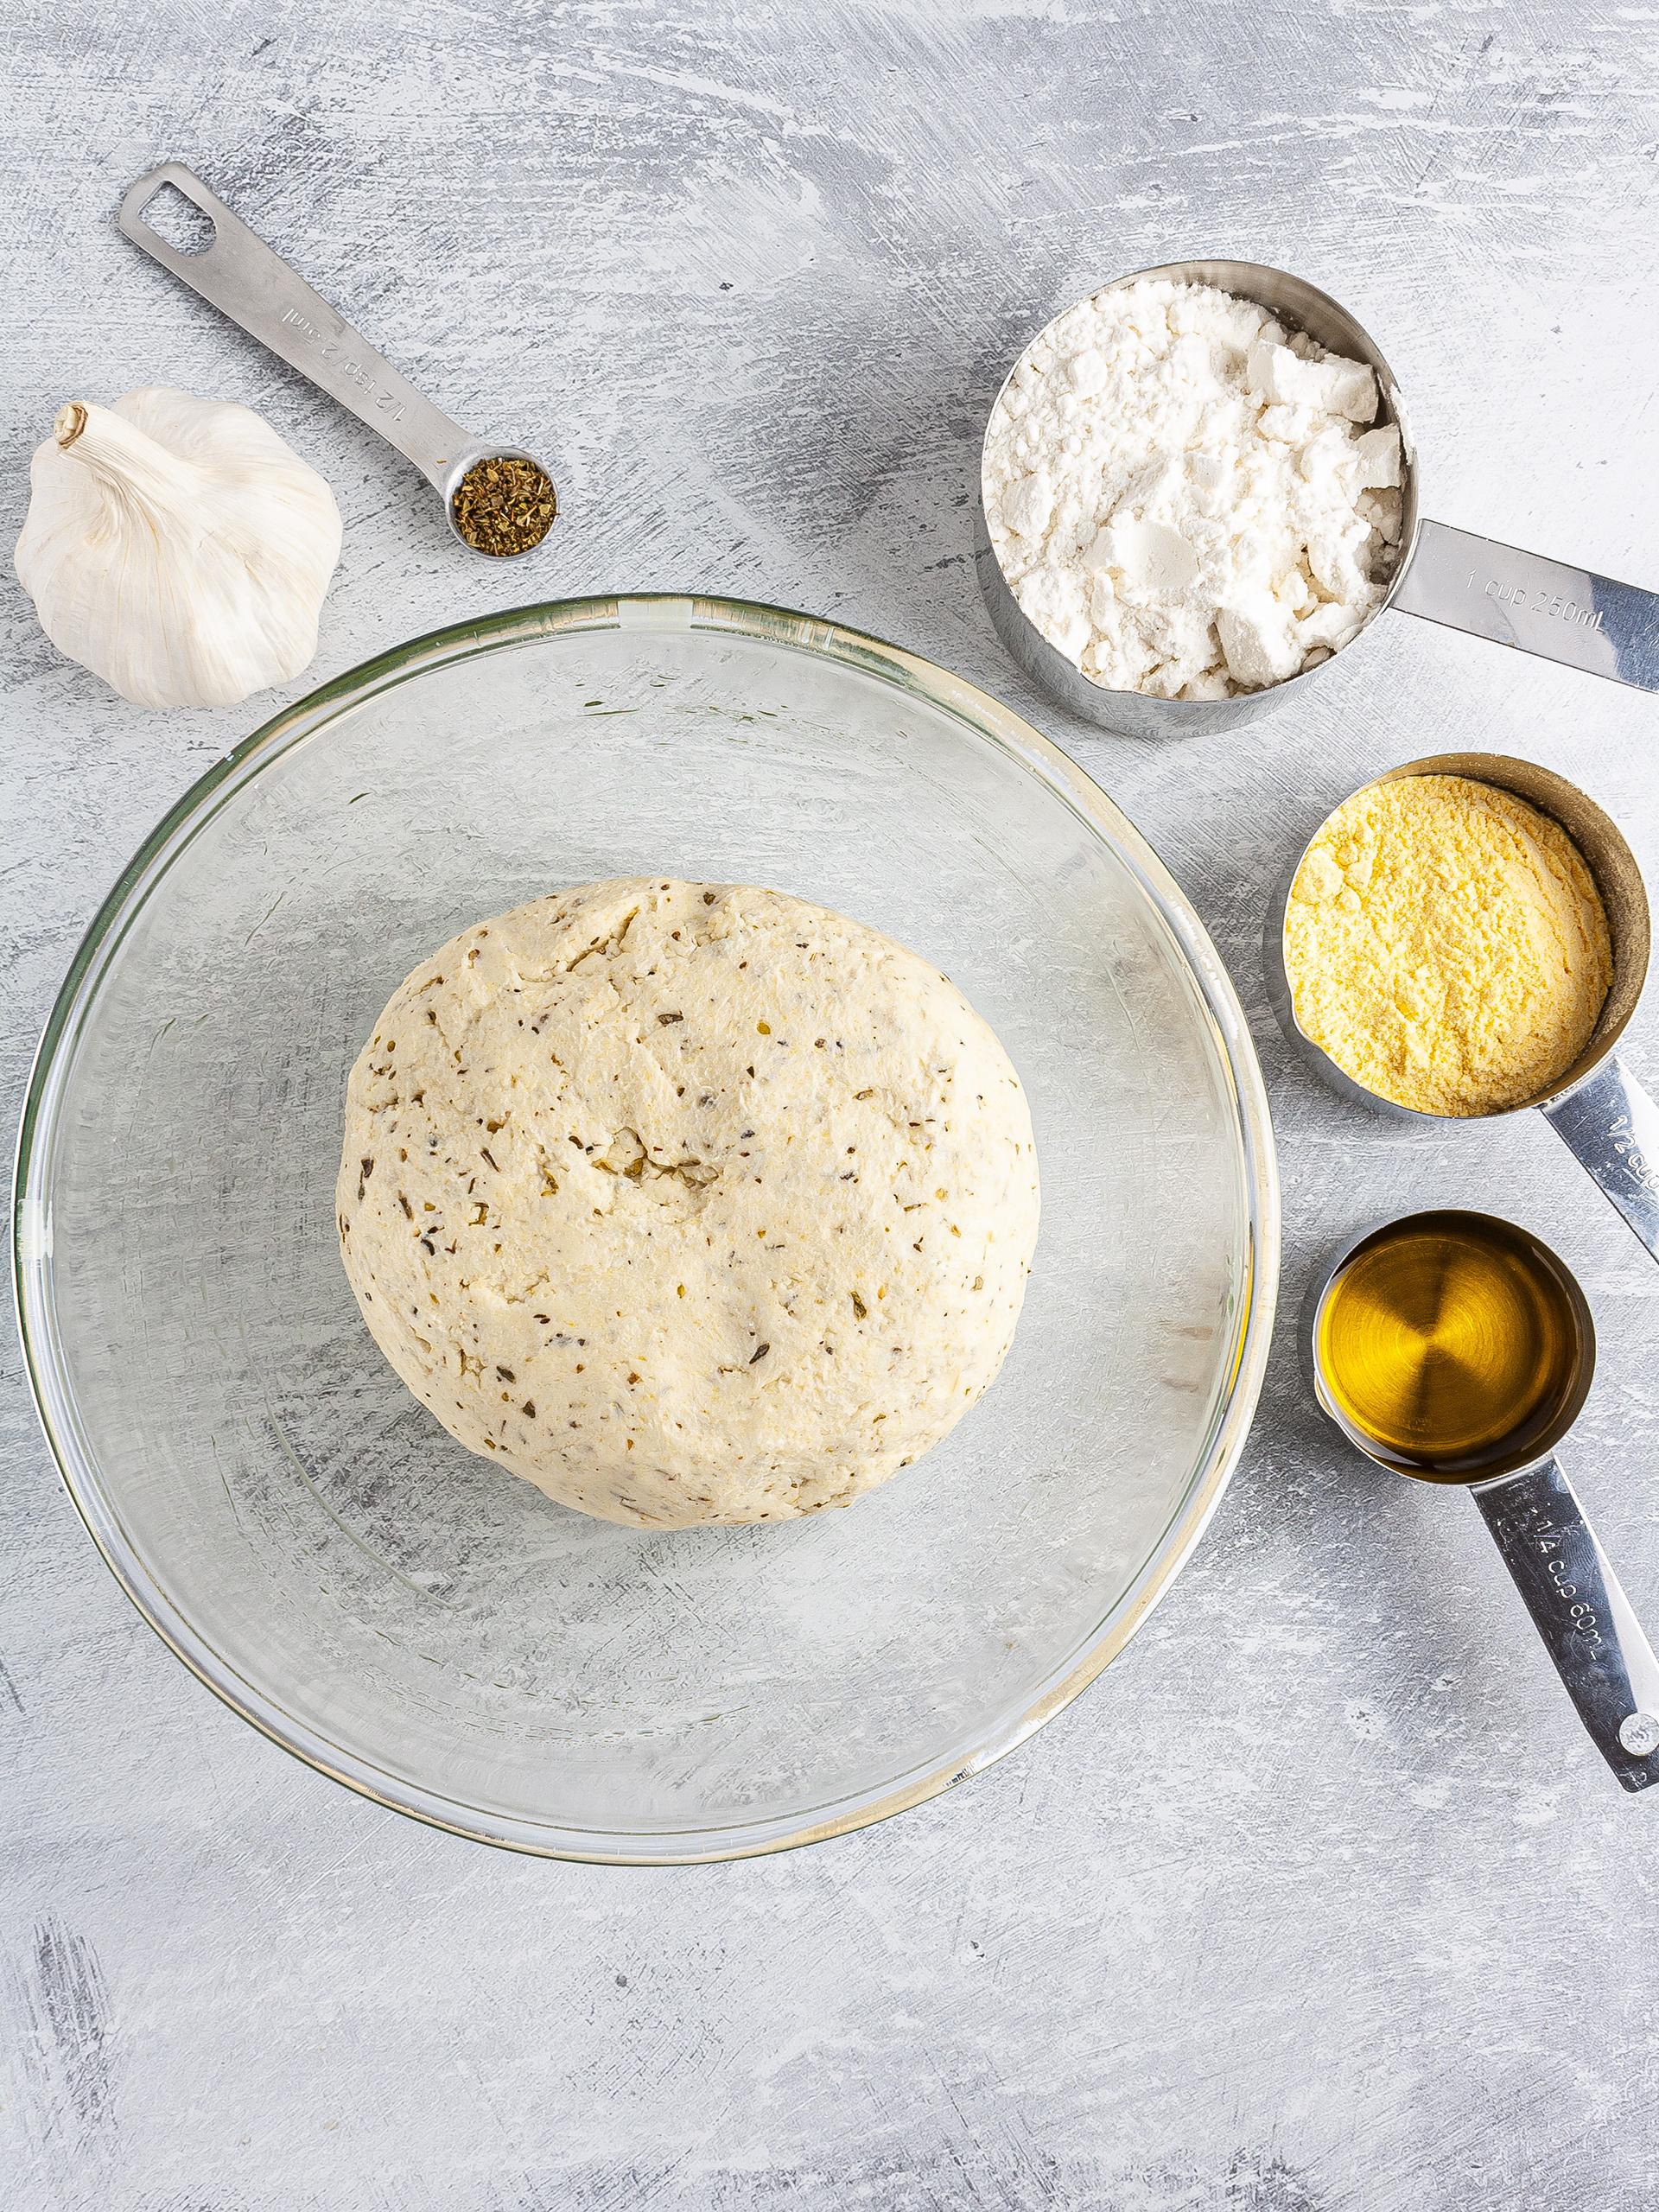 Gluten-free breadstick dough in a bowl